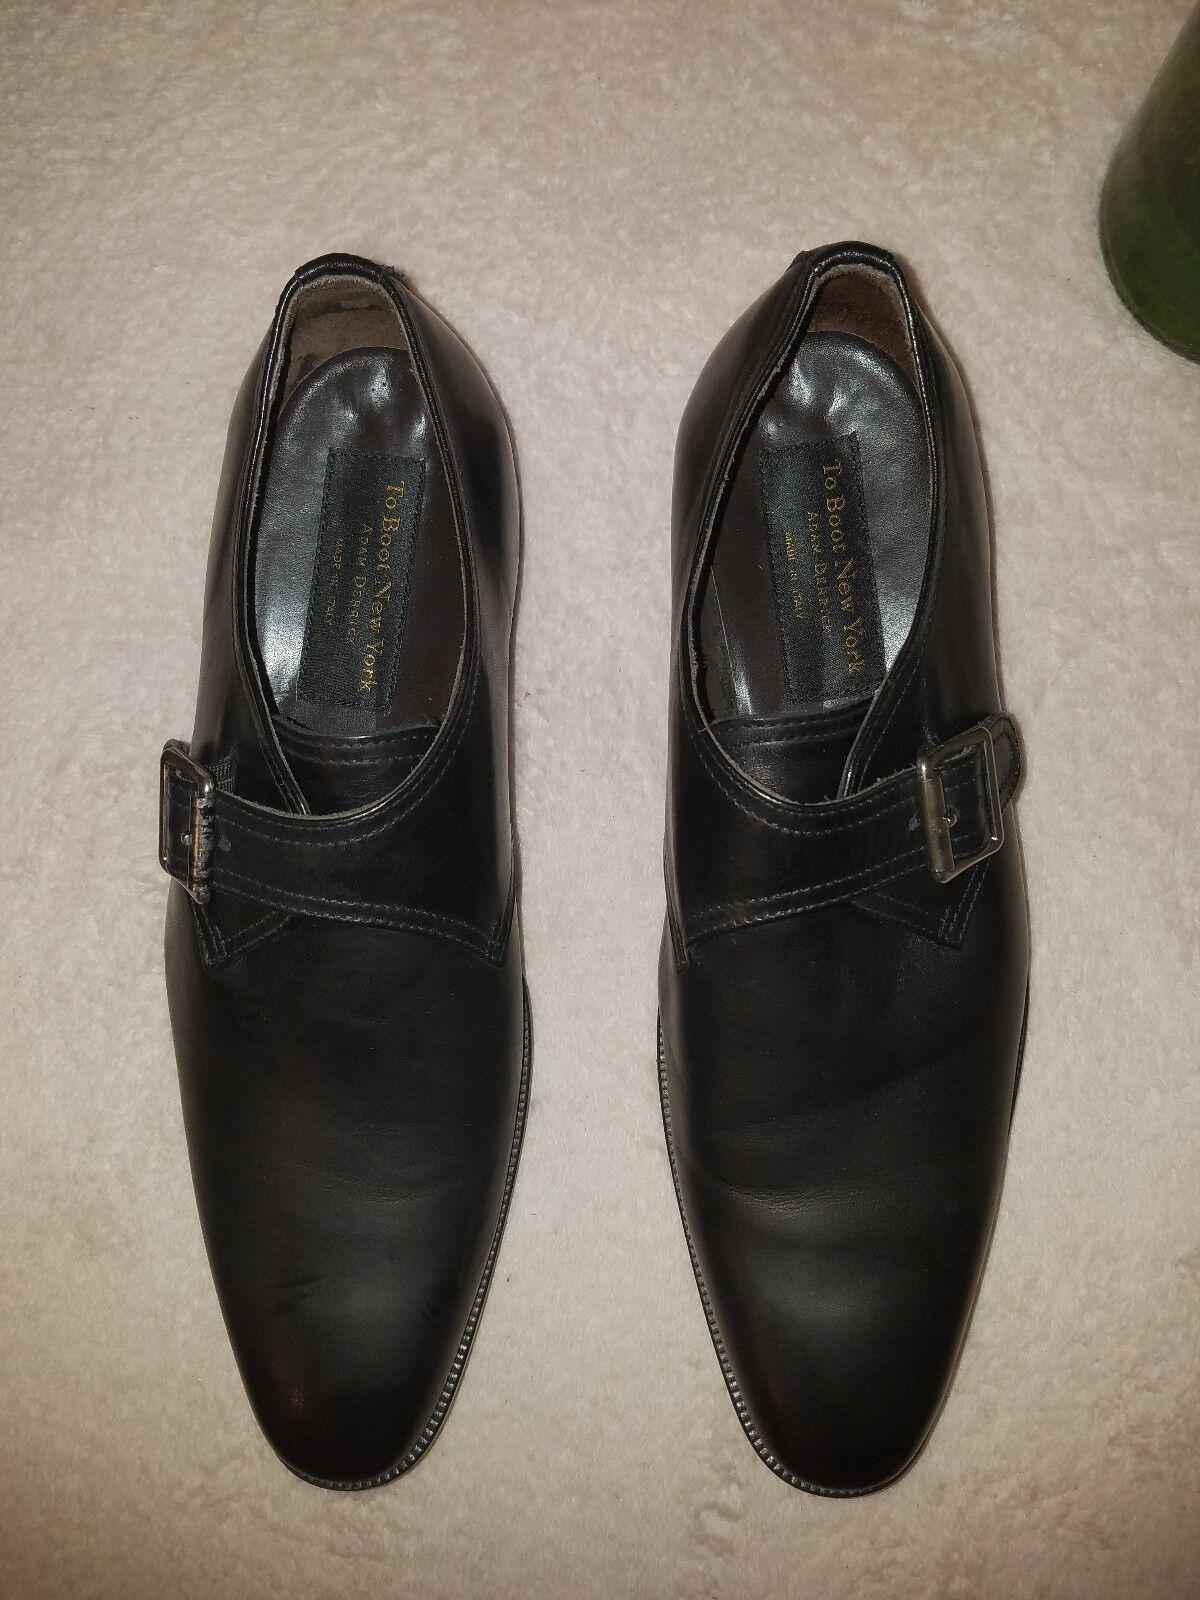 To Boot  New York Adam Derrick Emmett Monk Strap shoes black size 11.5  395